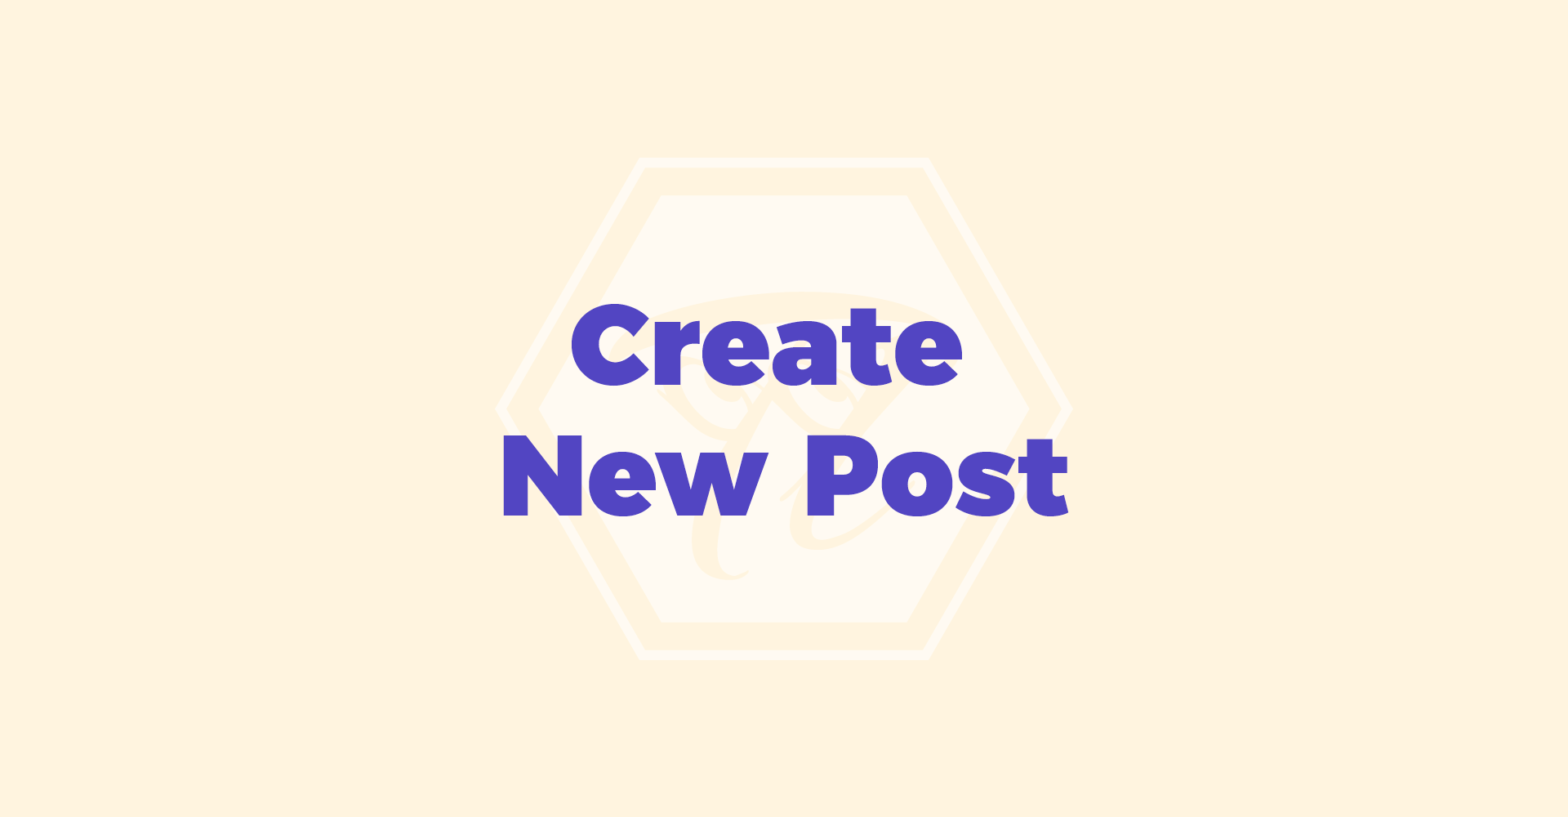 create__new_post 1 1568x817